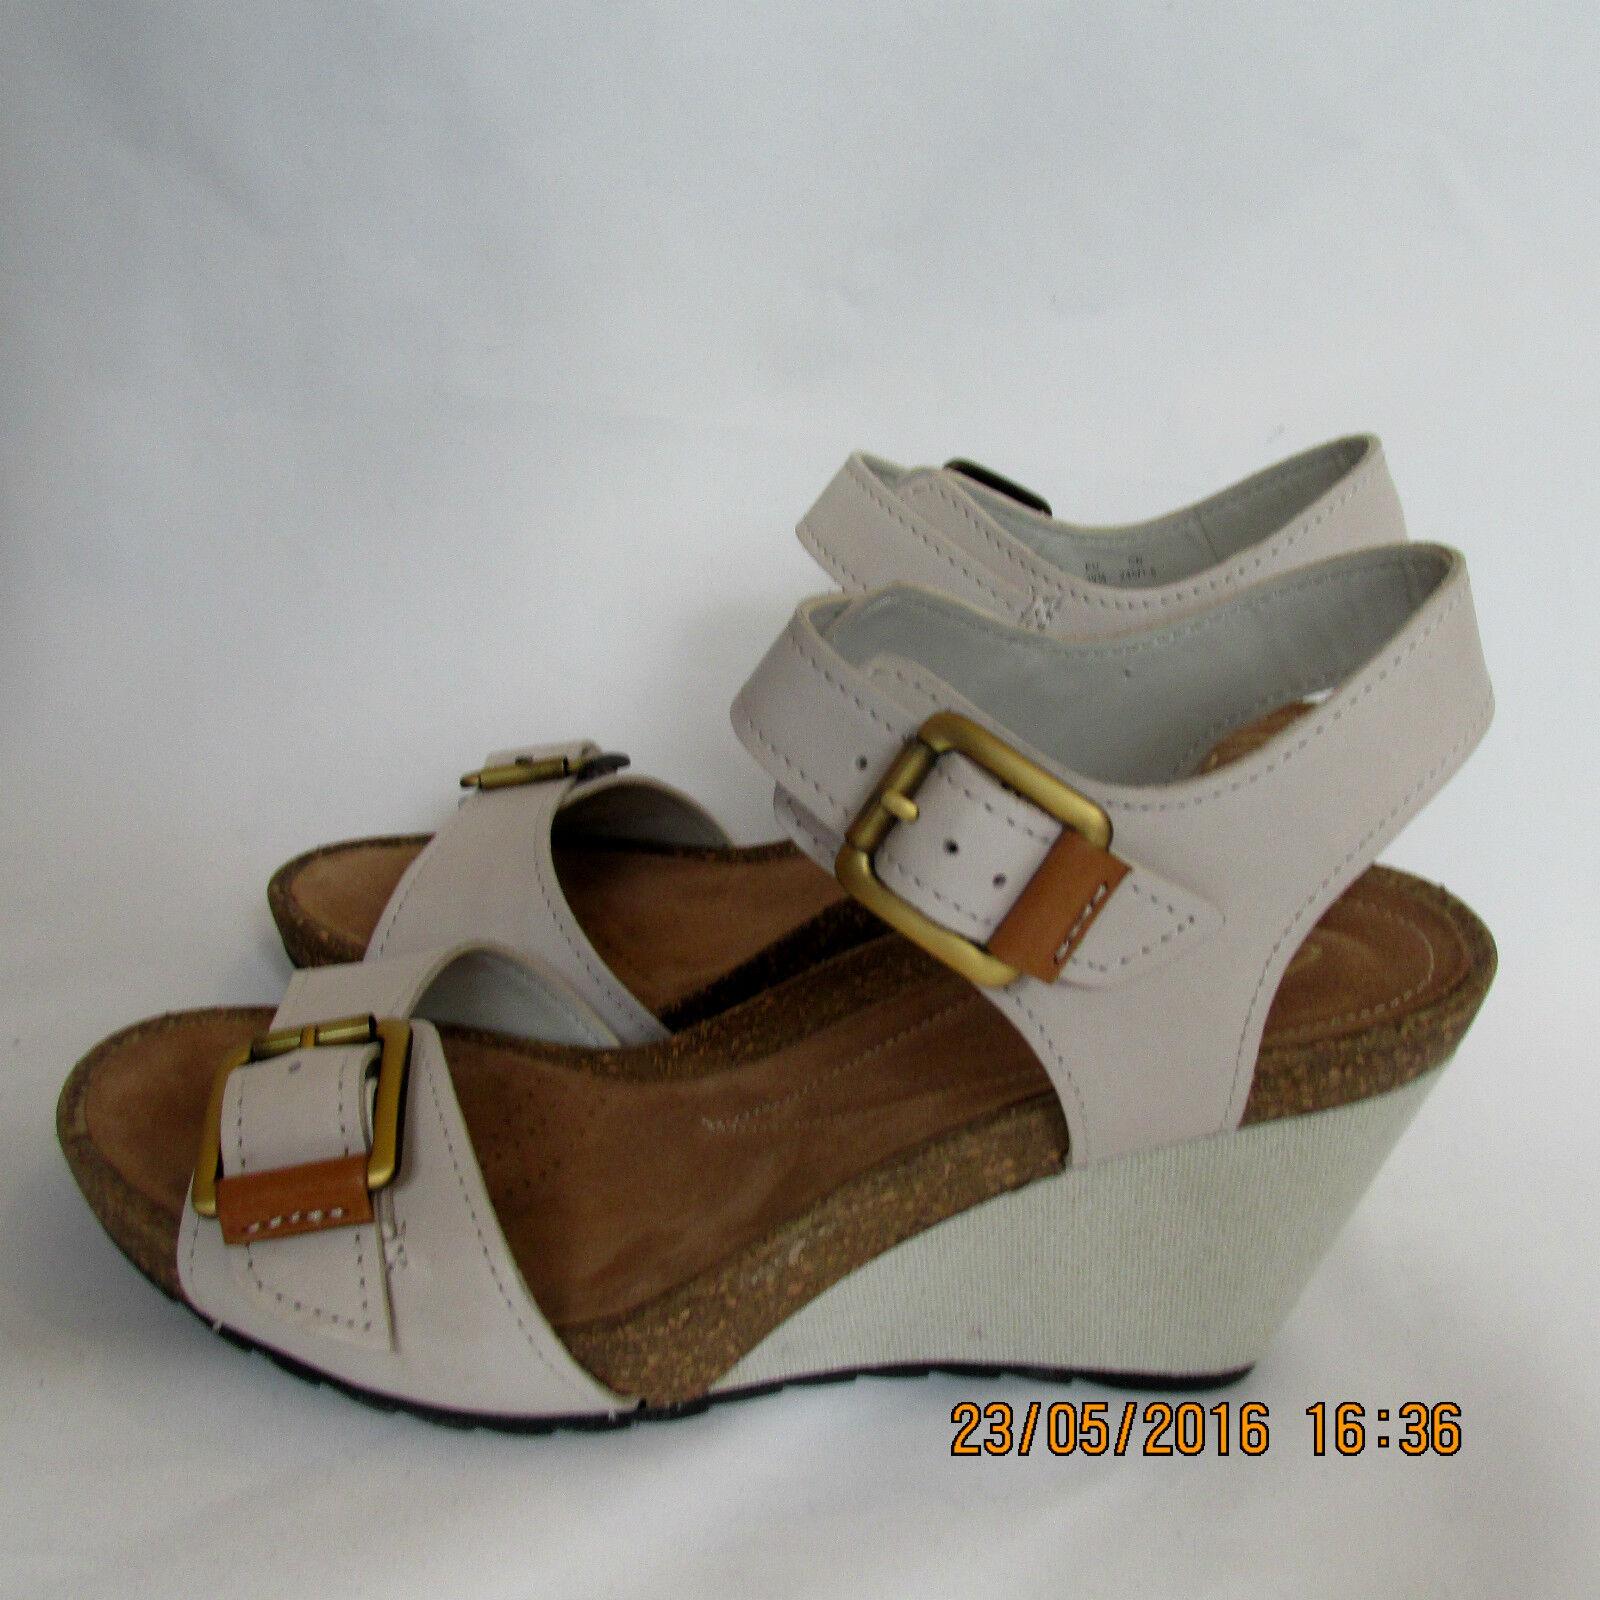 Artisan Clarks De Cuero Sandalias Mujer Para Nuevas Ztkiwopux Cuñas IbgyfY7m6v